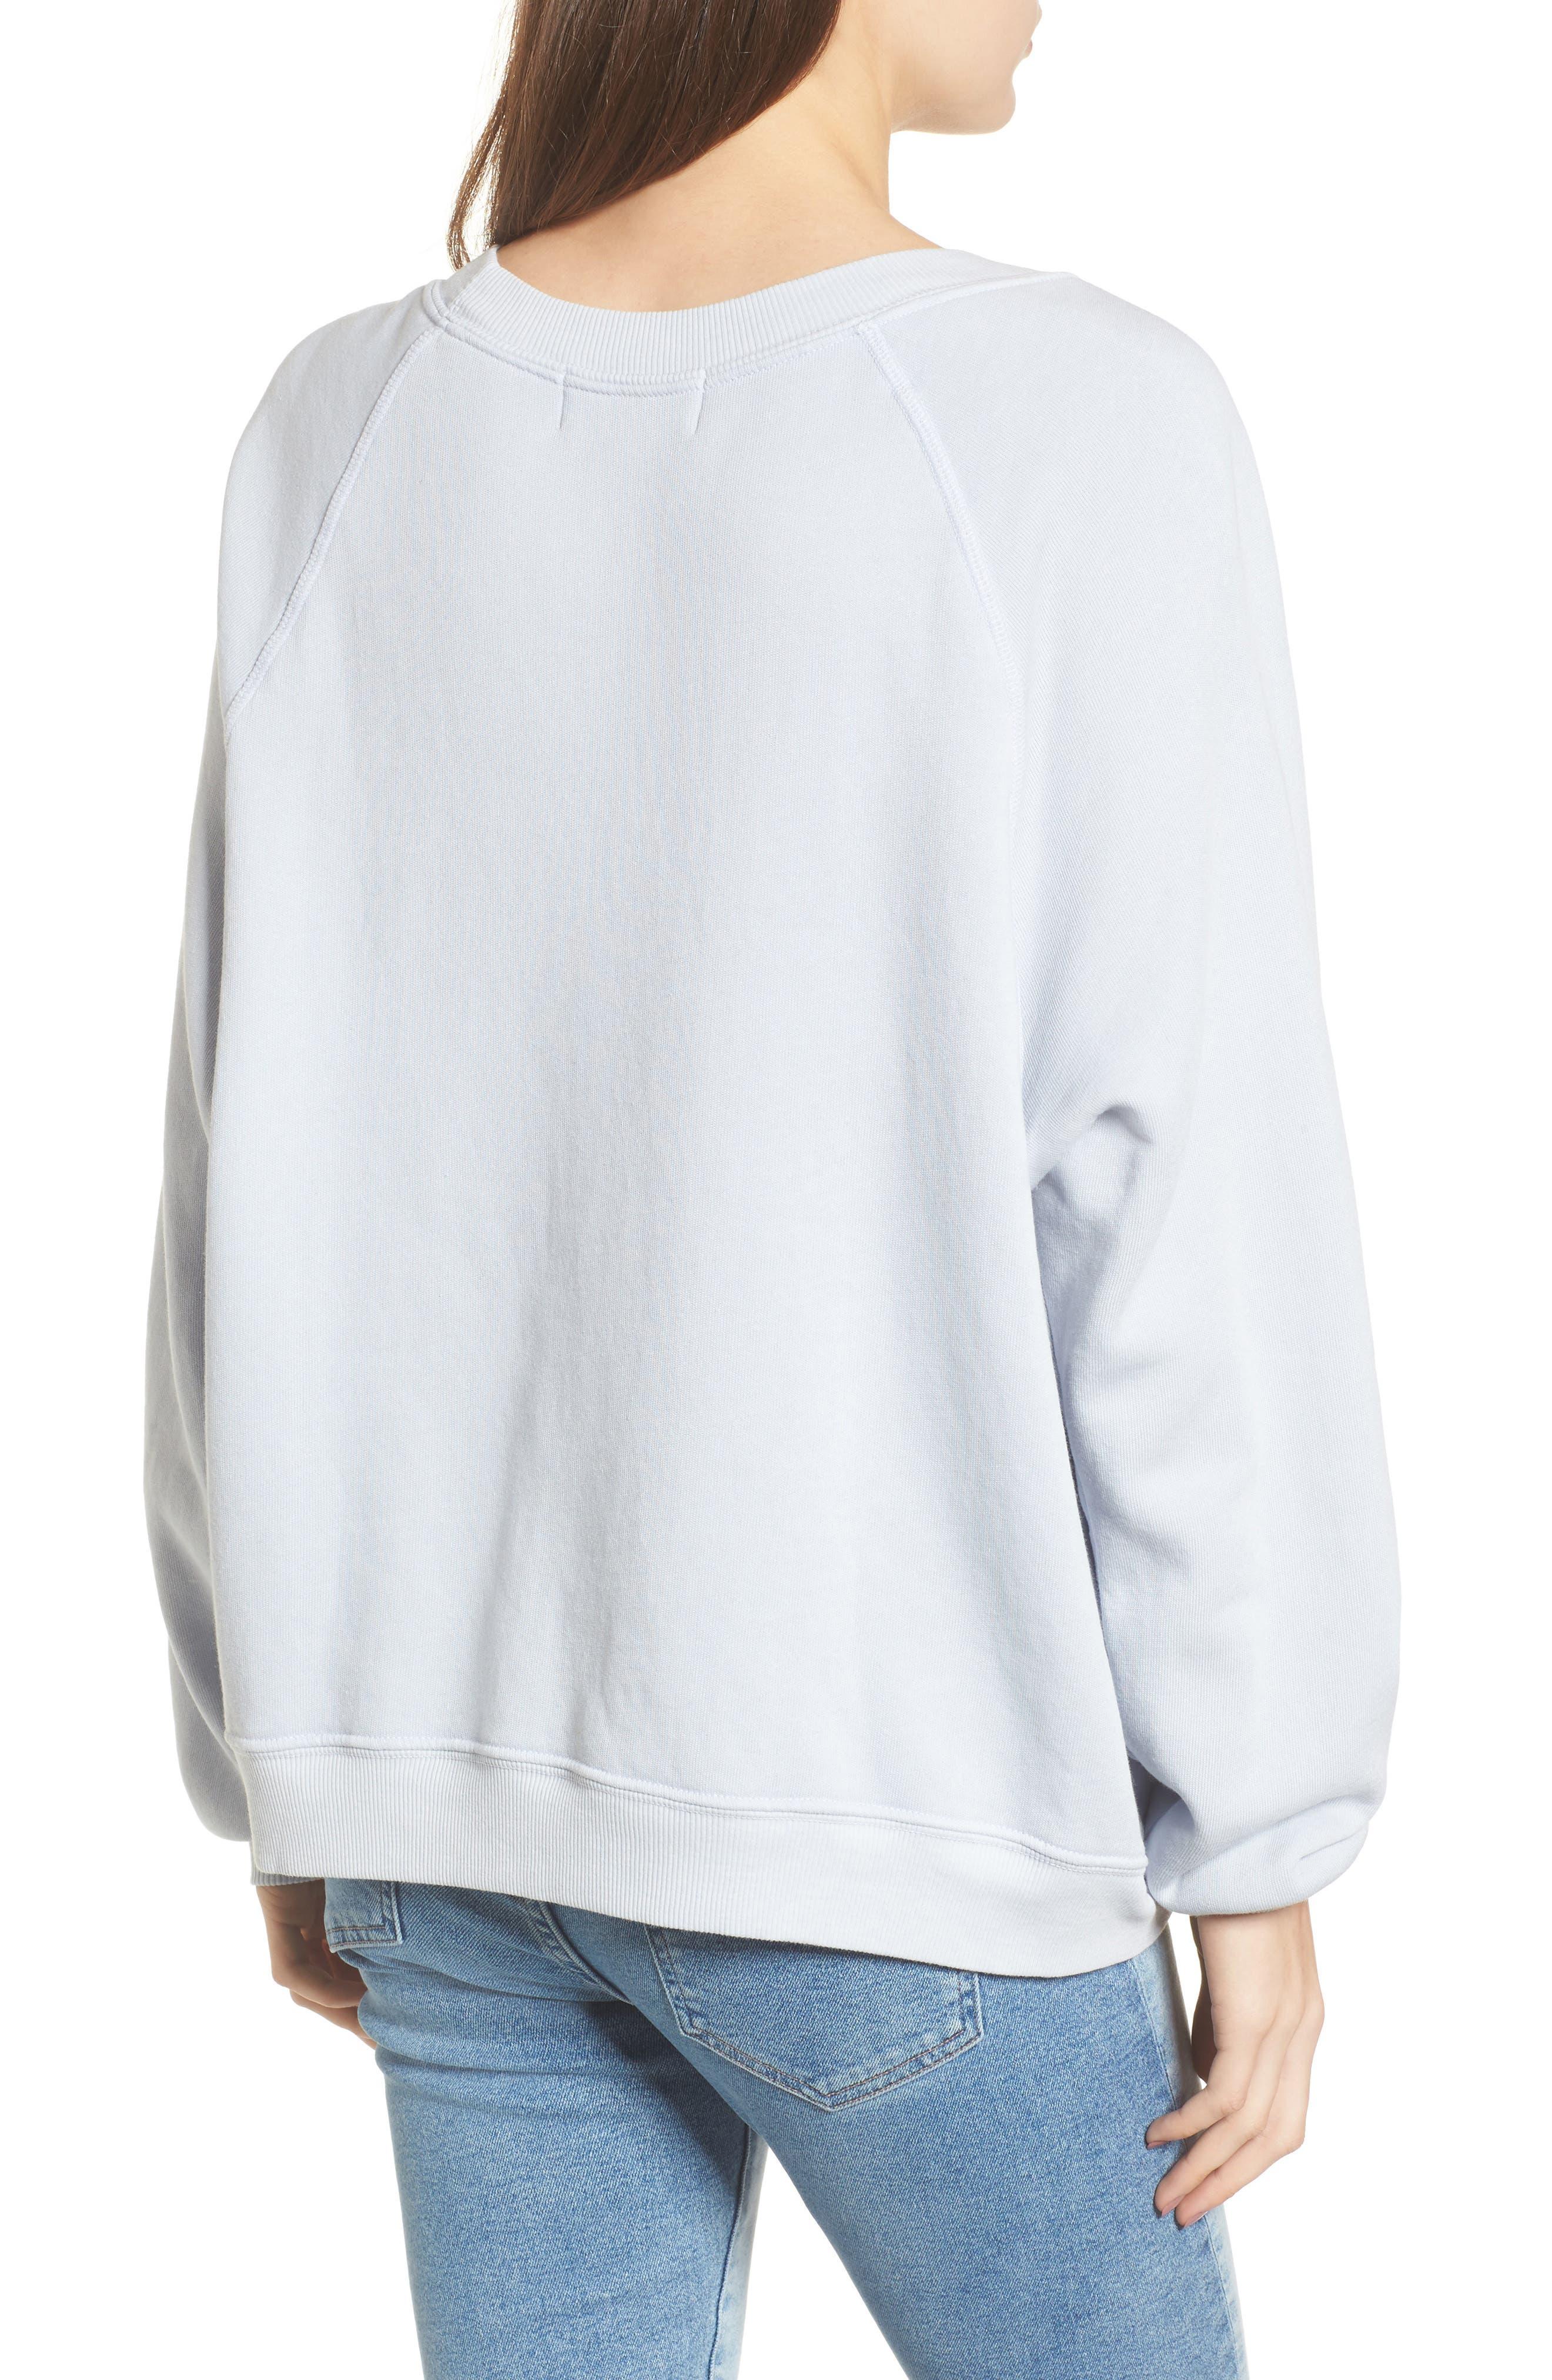 California Sommers Sweatshirt,                             Alternate thumbnail 2, color,                             Blue Ribbon